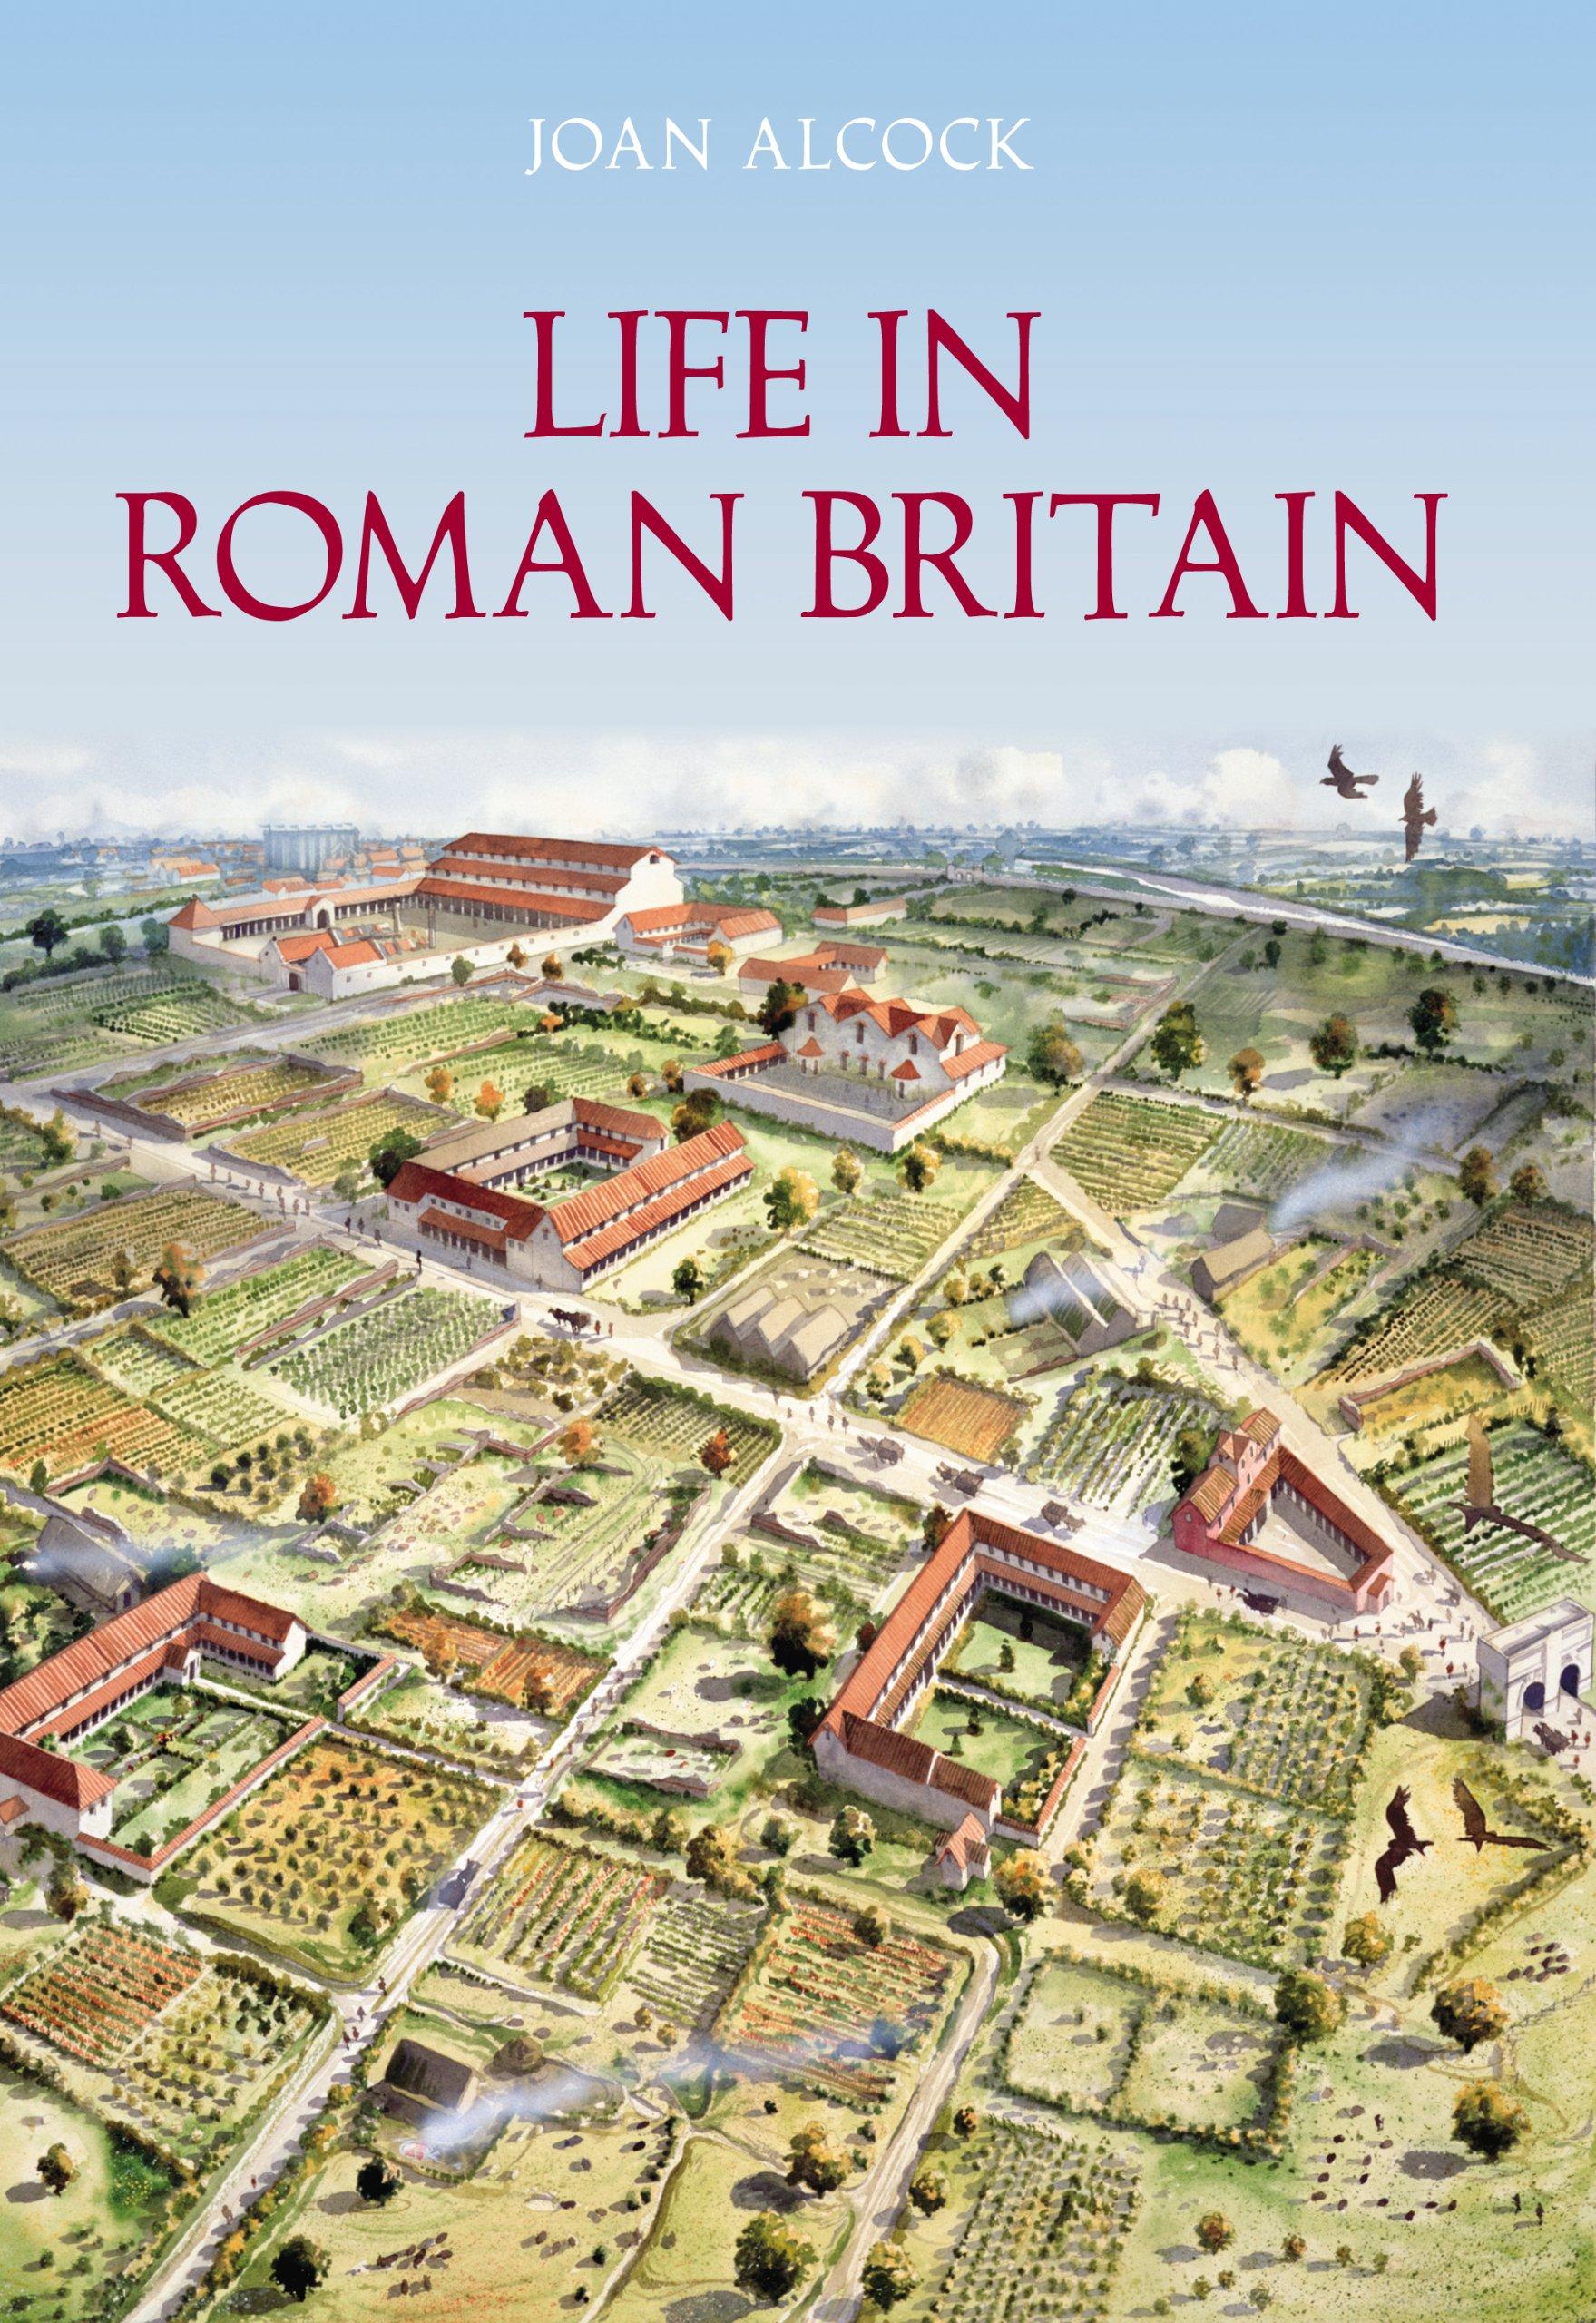 Life in roman britain amazon joan p alcock 9780752435930 life in roman britain amazon joan p alcock 9780752435930 books fandeluxe Document